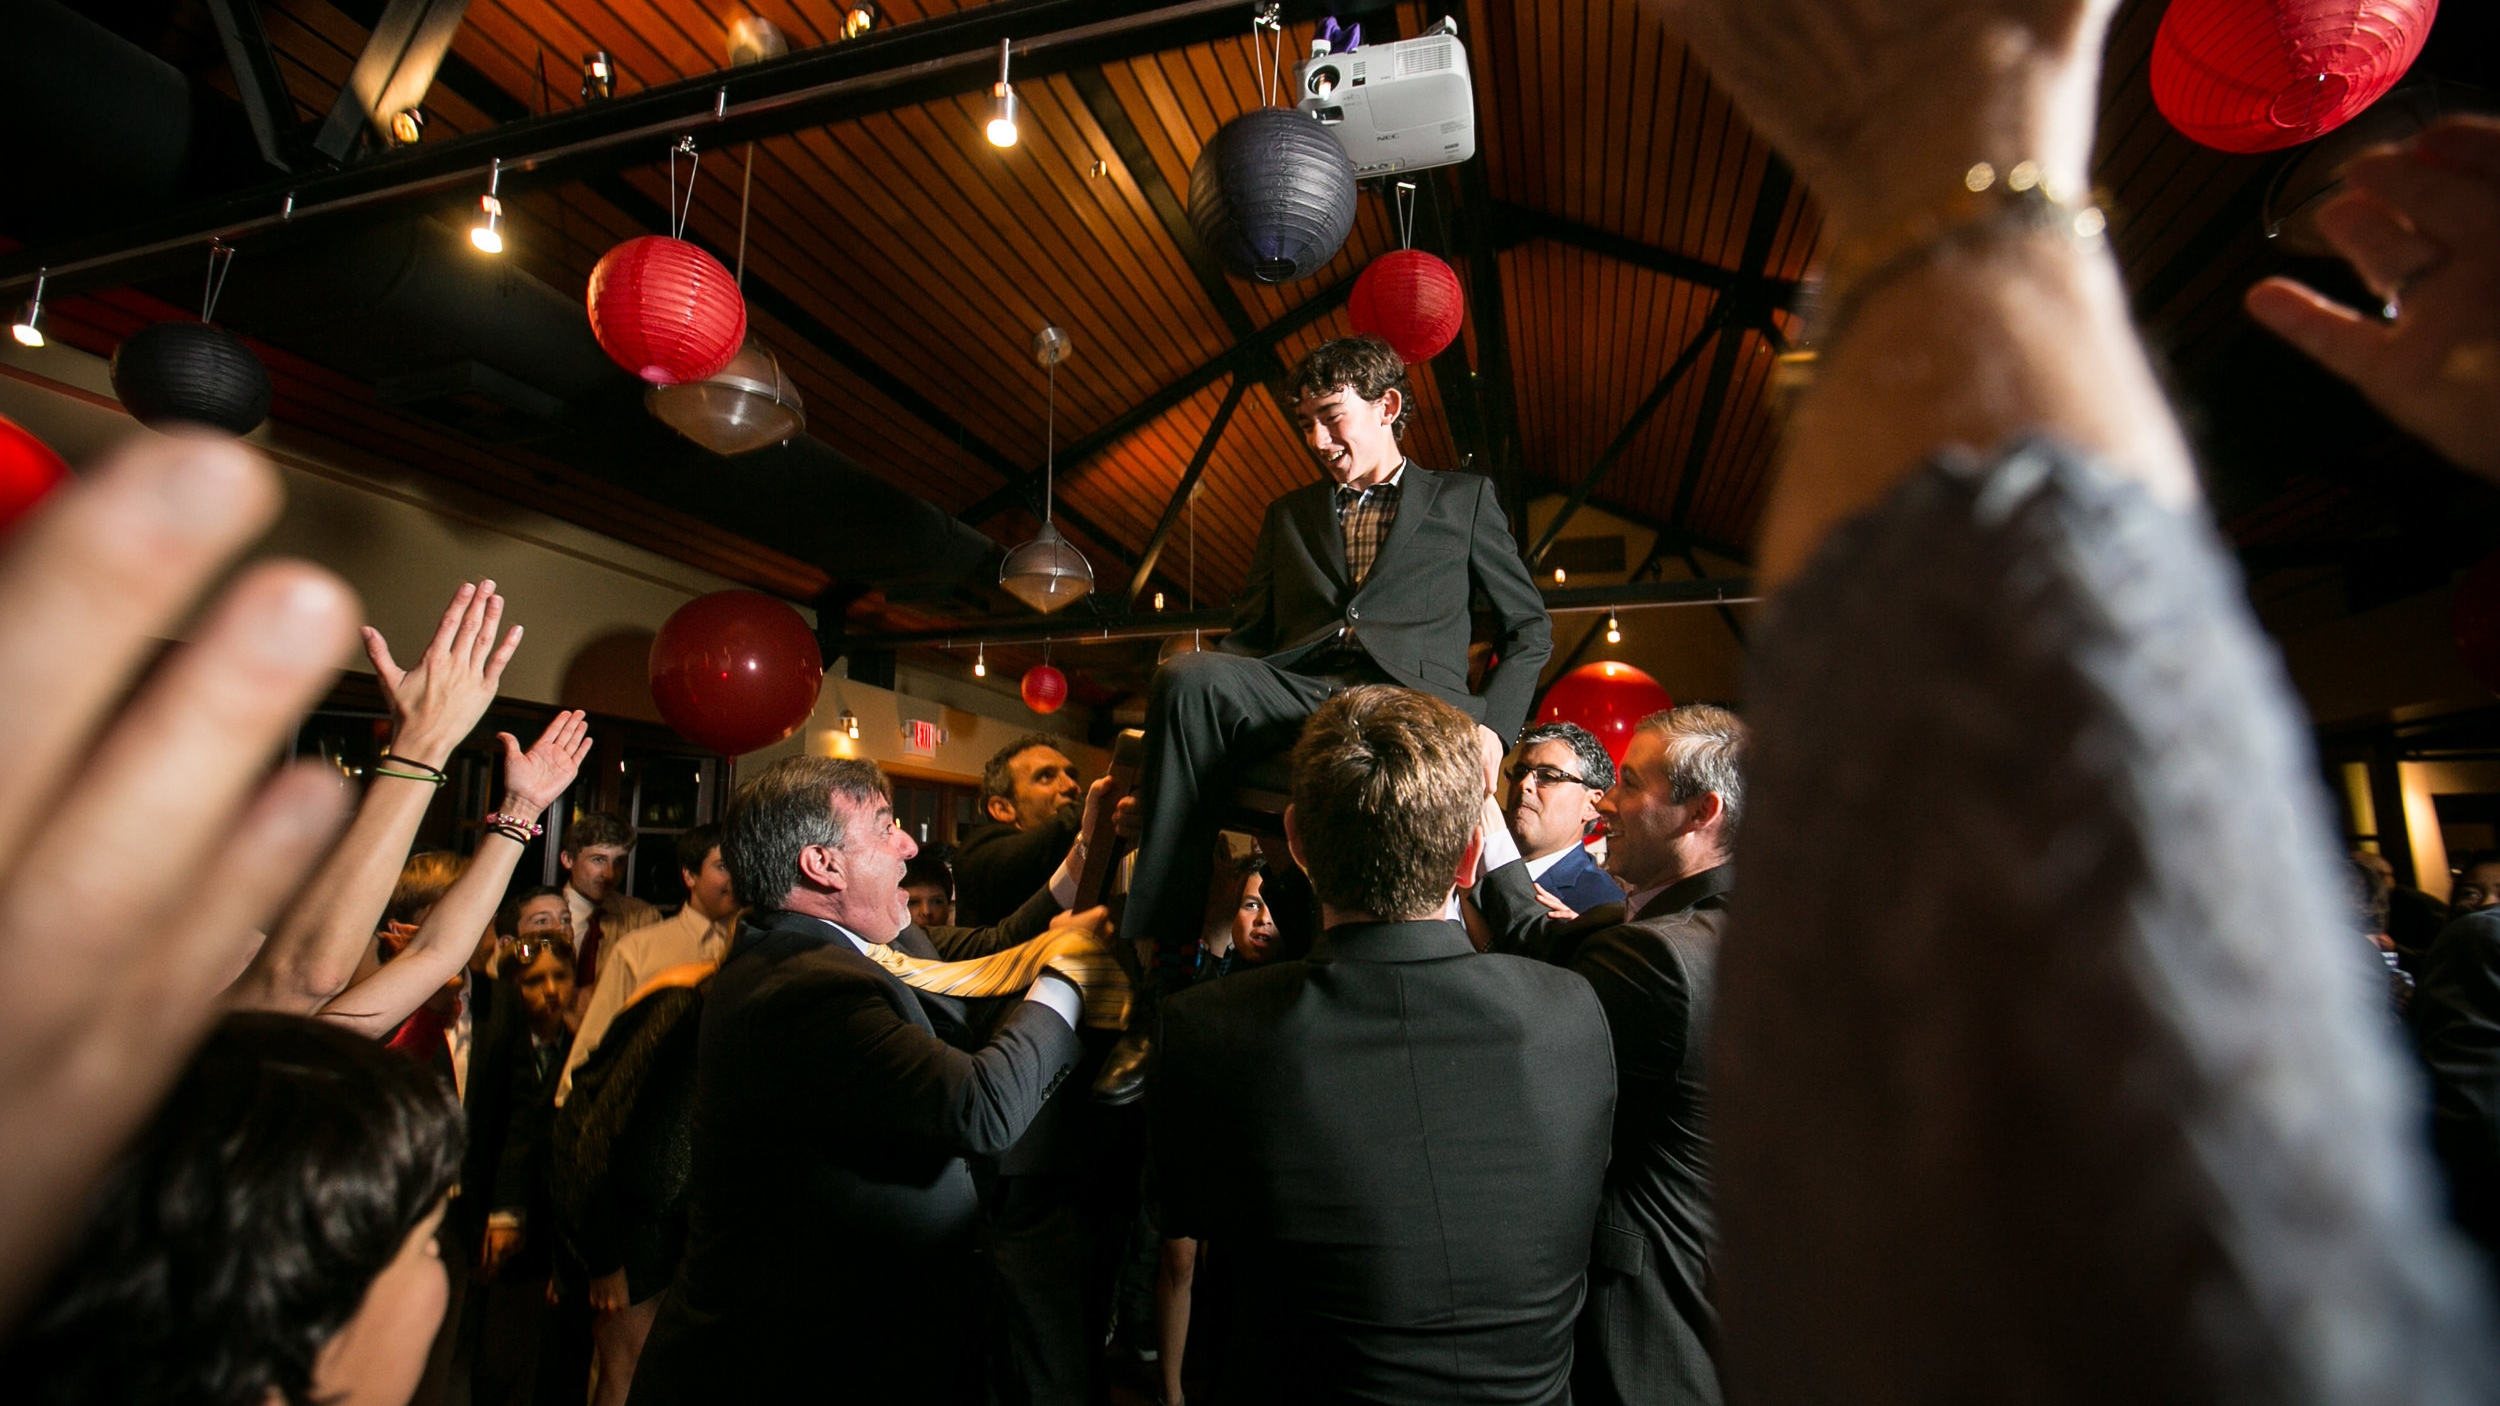 00270_20141115192810_San_Francisco_Wedding_Photographer_Sees_The_Day.jpg